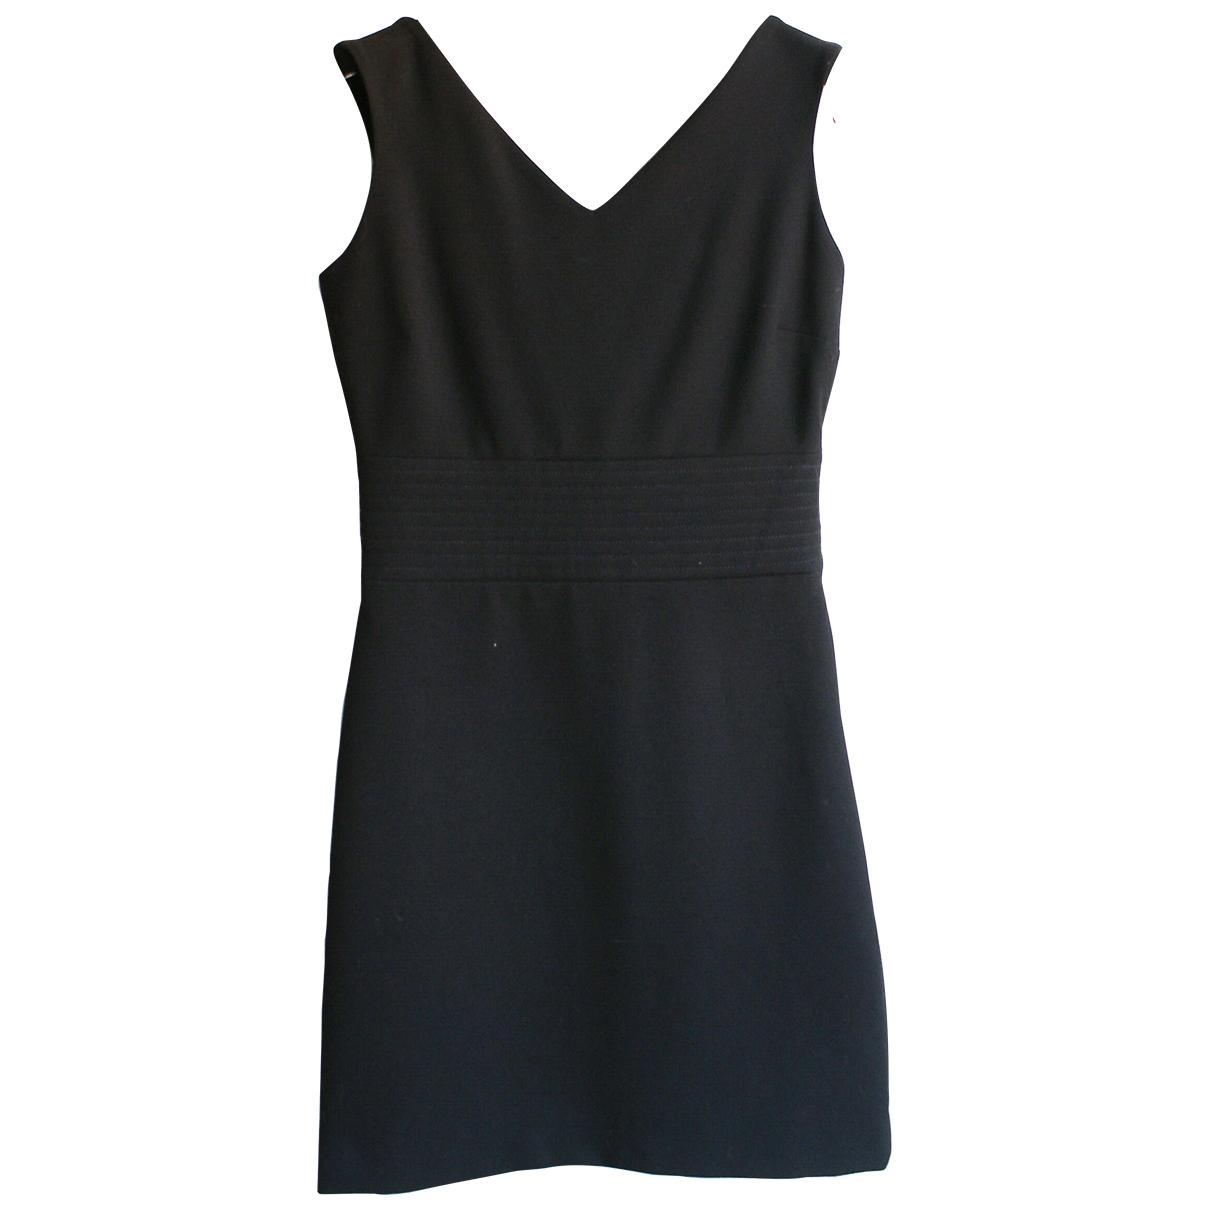 Maje Fall Winter 2019 Black dress for Women 1 US